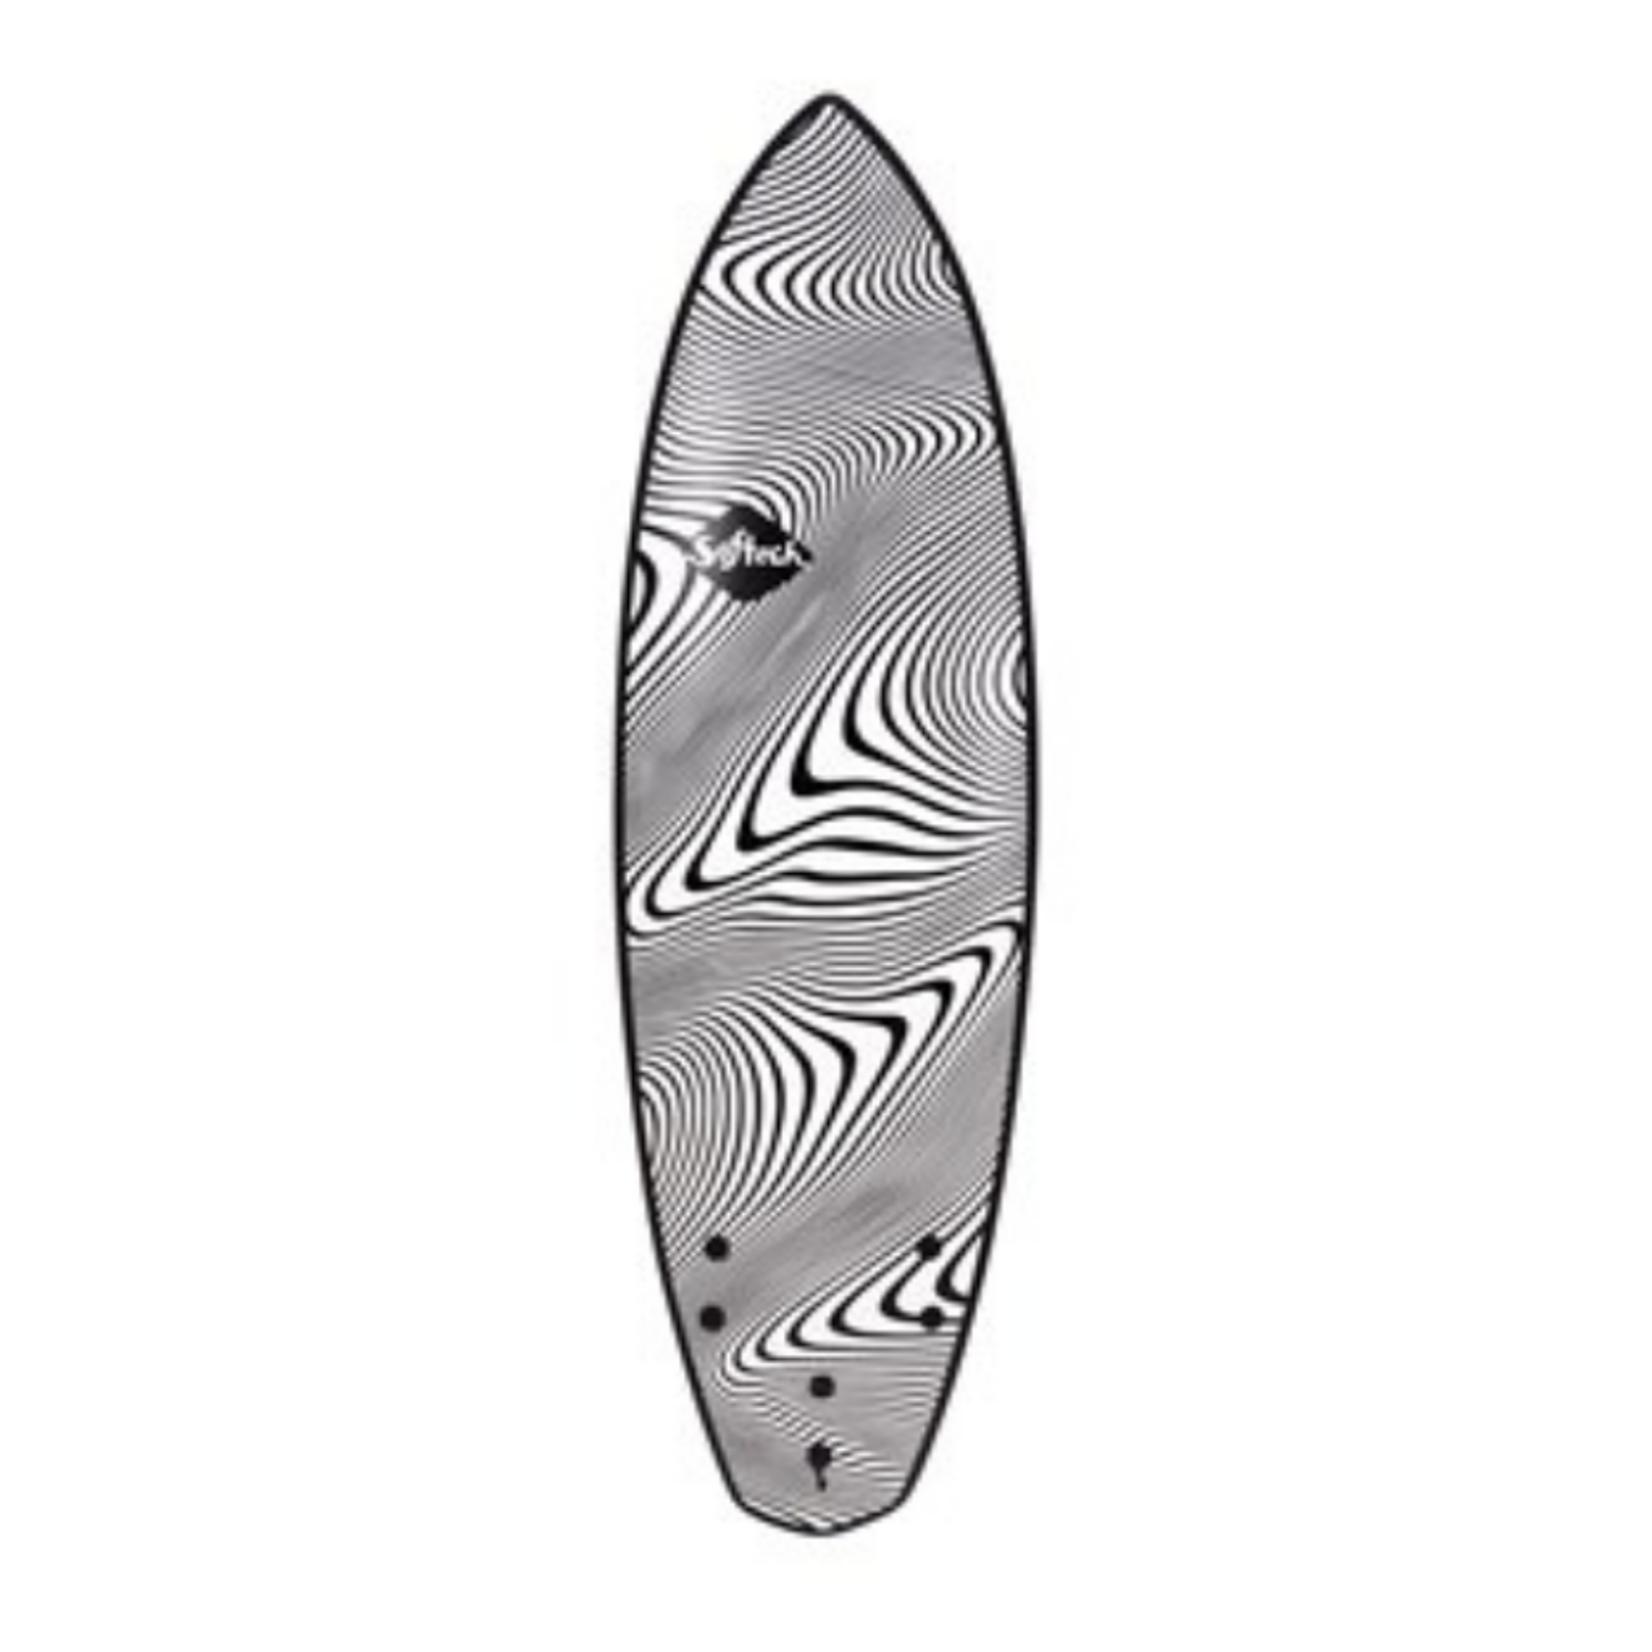 Softech Surfboards 5'11 Softech Toledo Wildfire Package